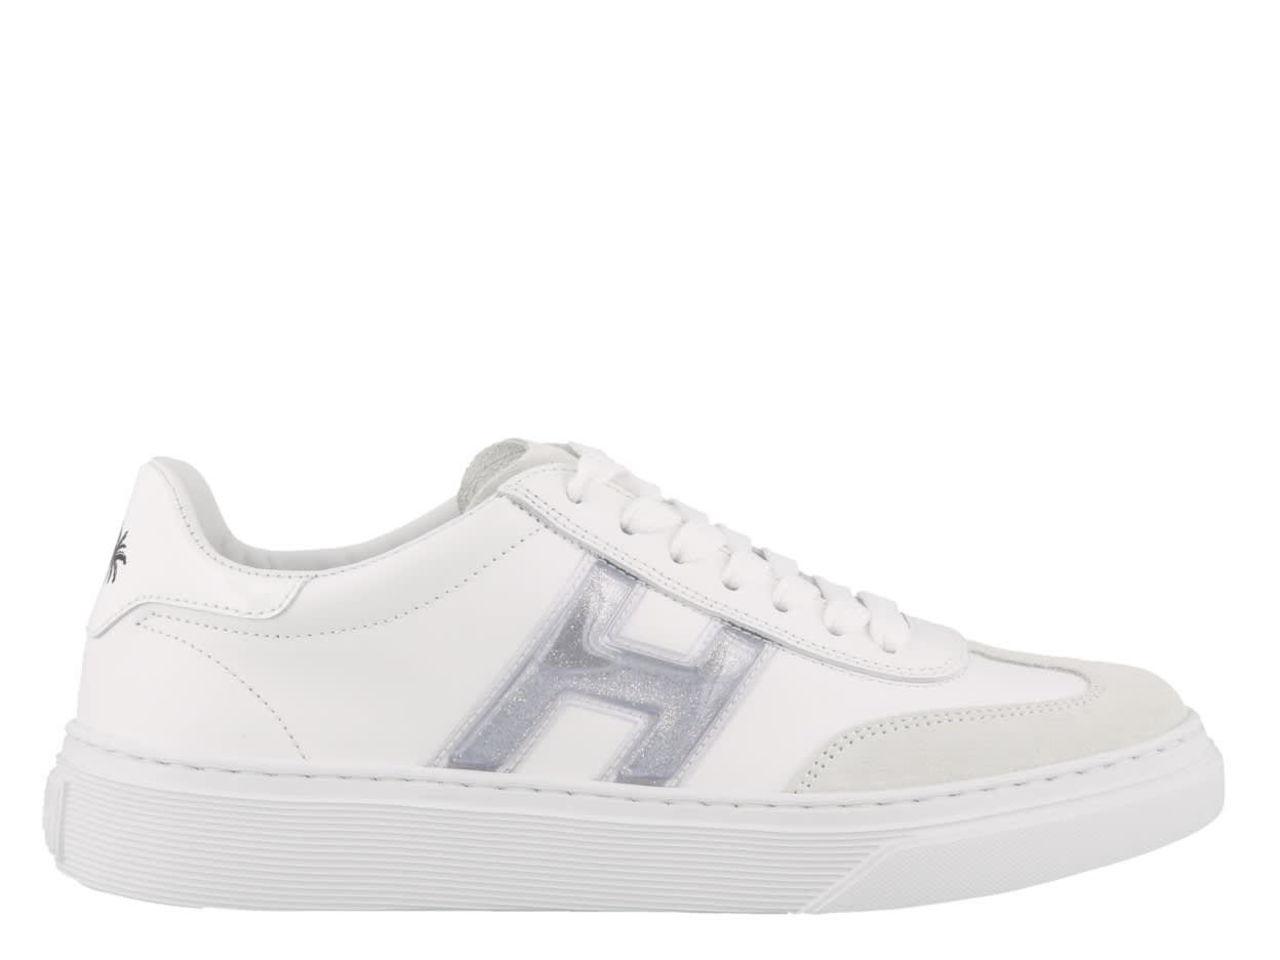 Hogan H365 Palms Print Sneakers